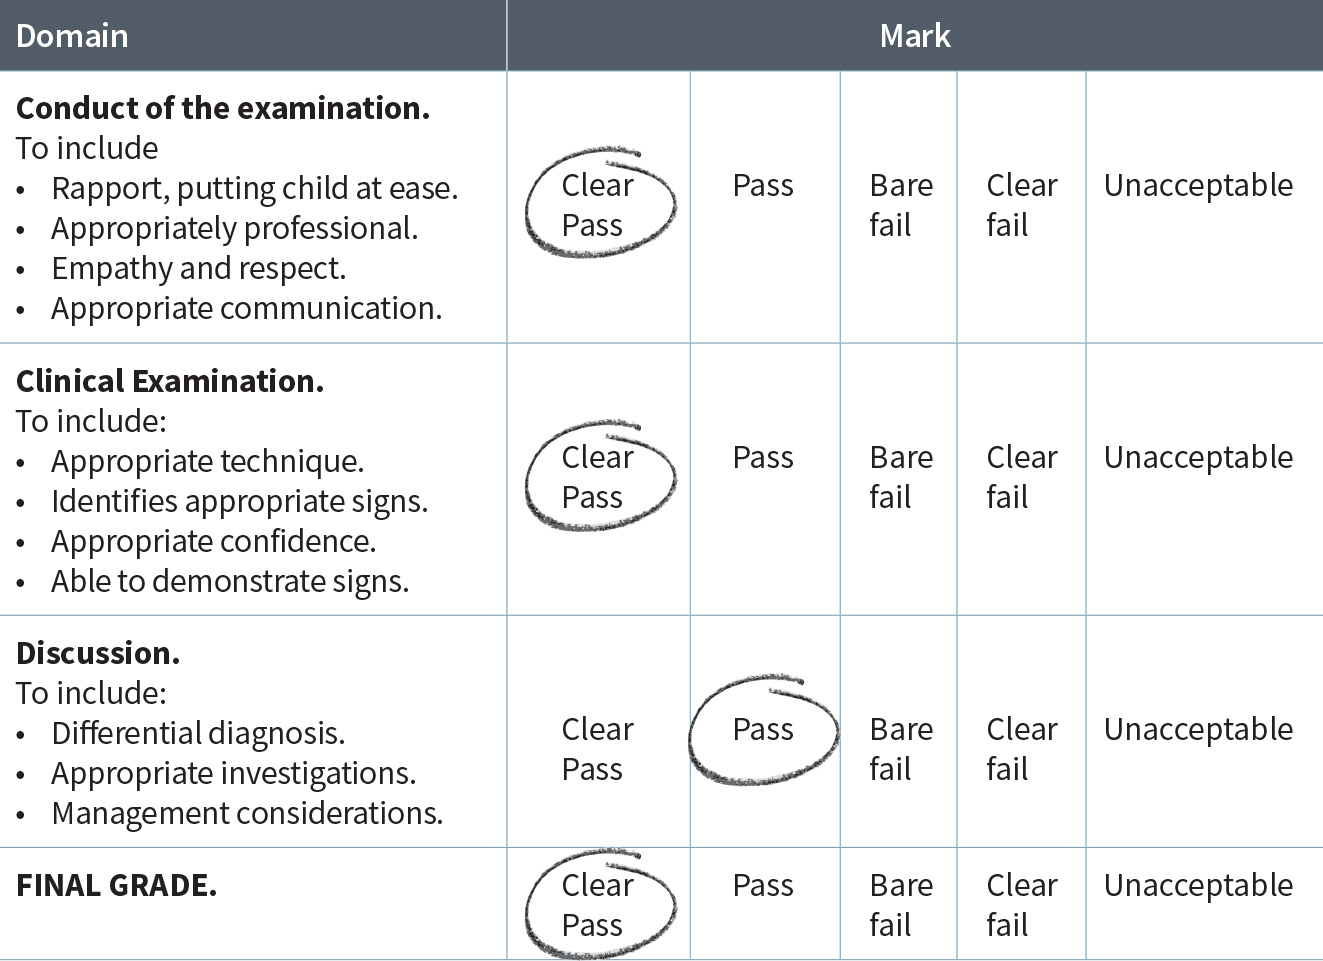 Examination Mark Scheme table